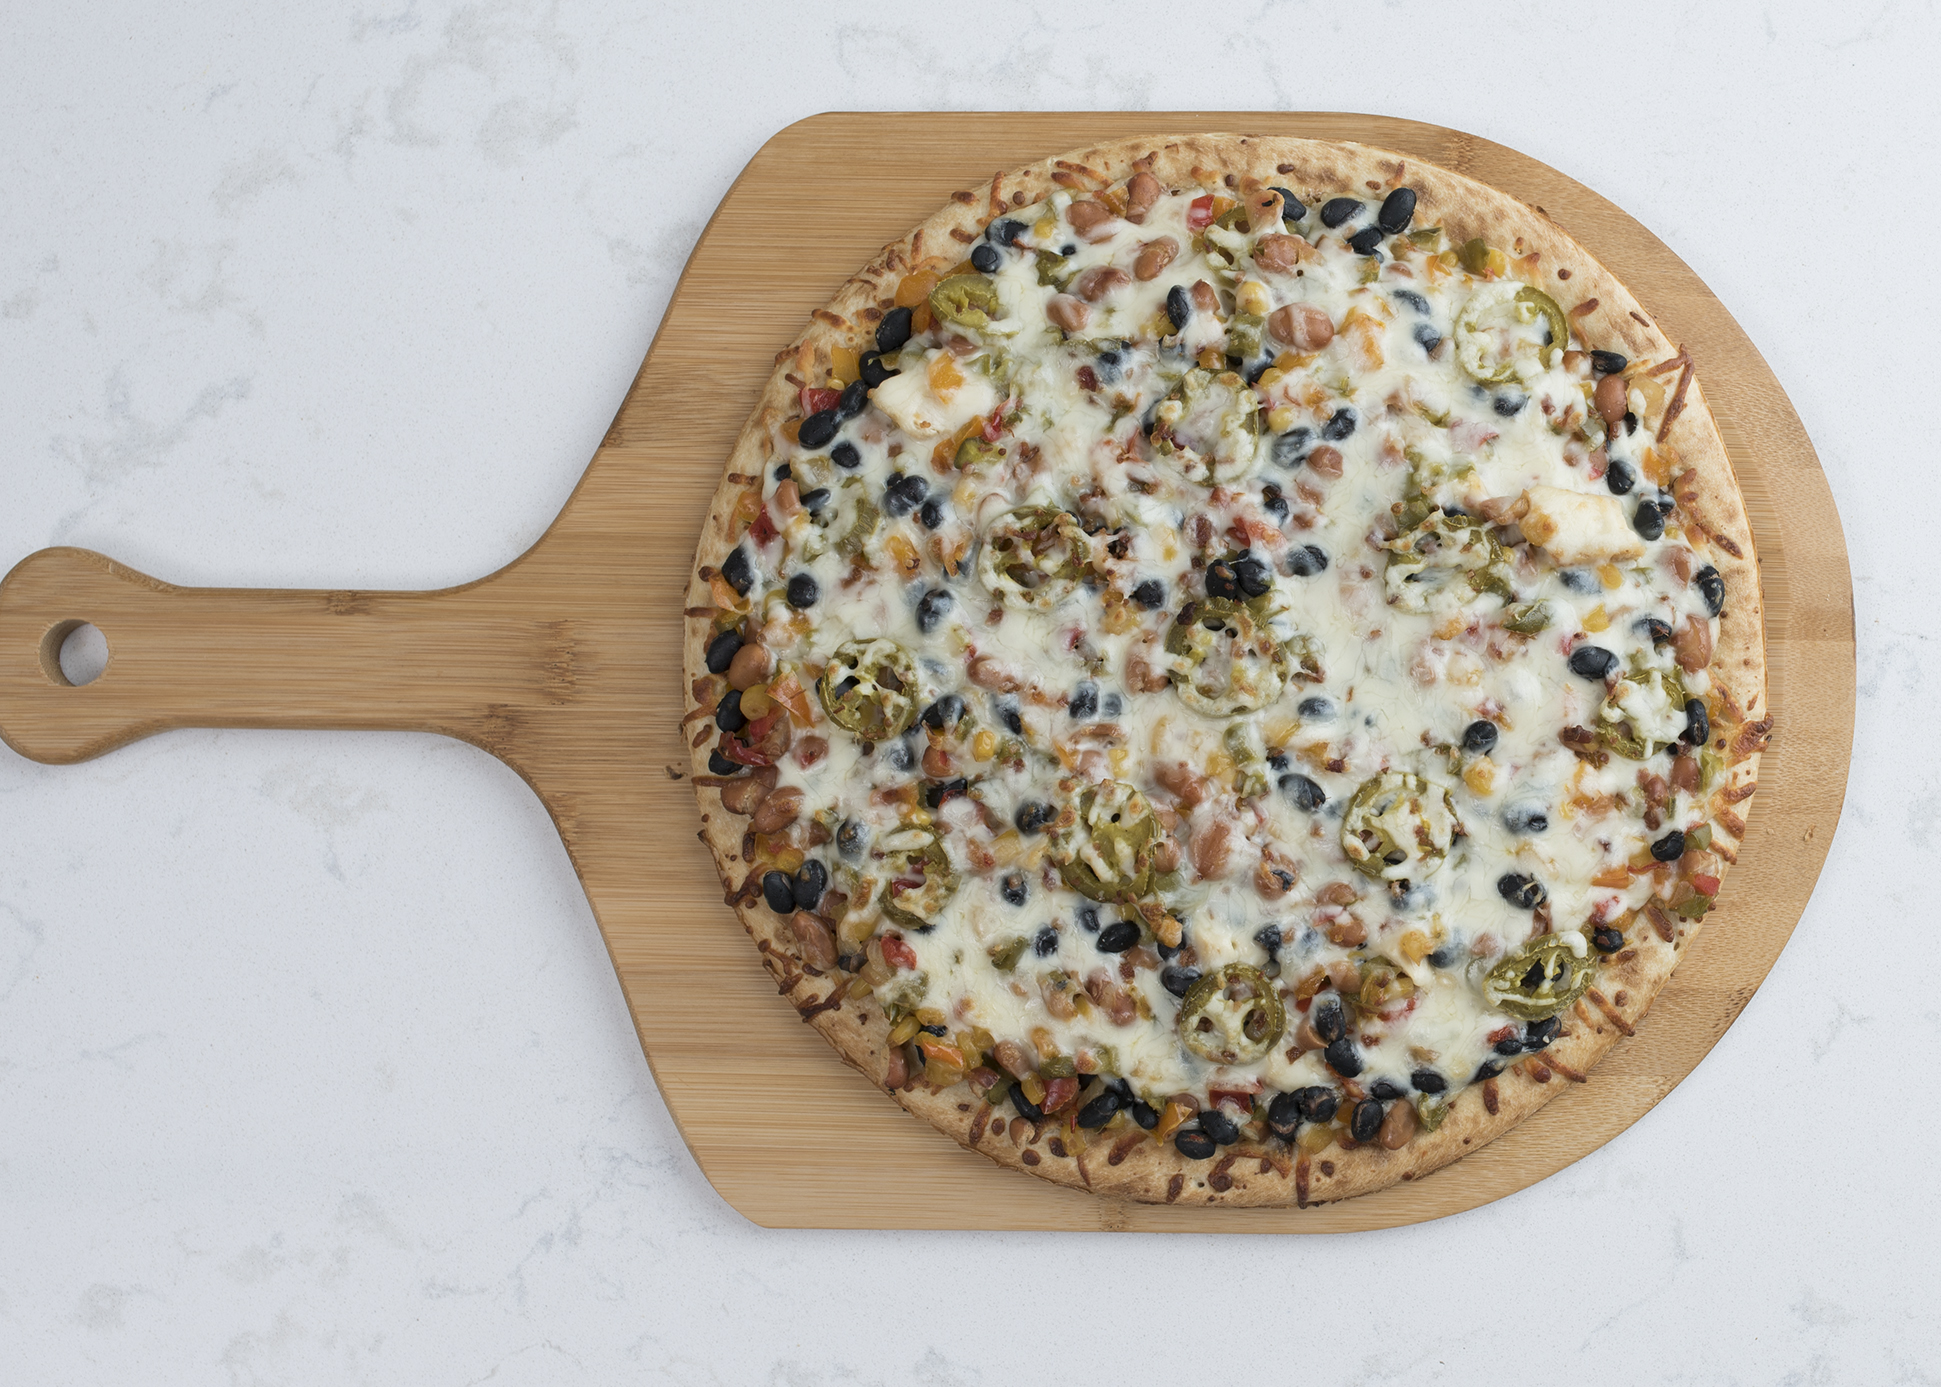 Pizza_SpicyCowboyCaviar.jpg